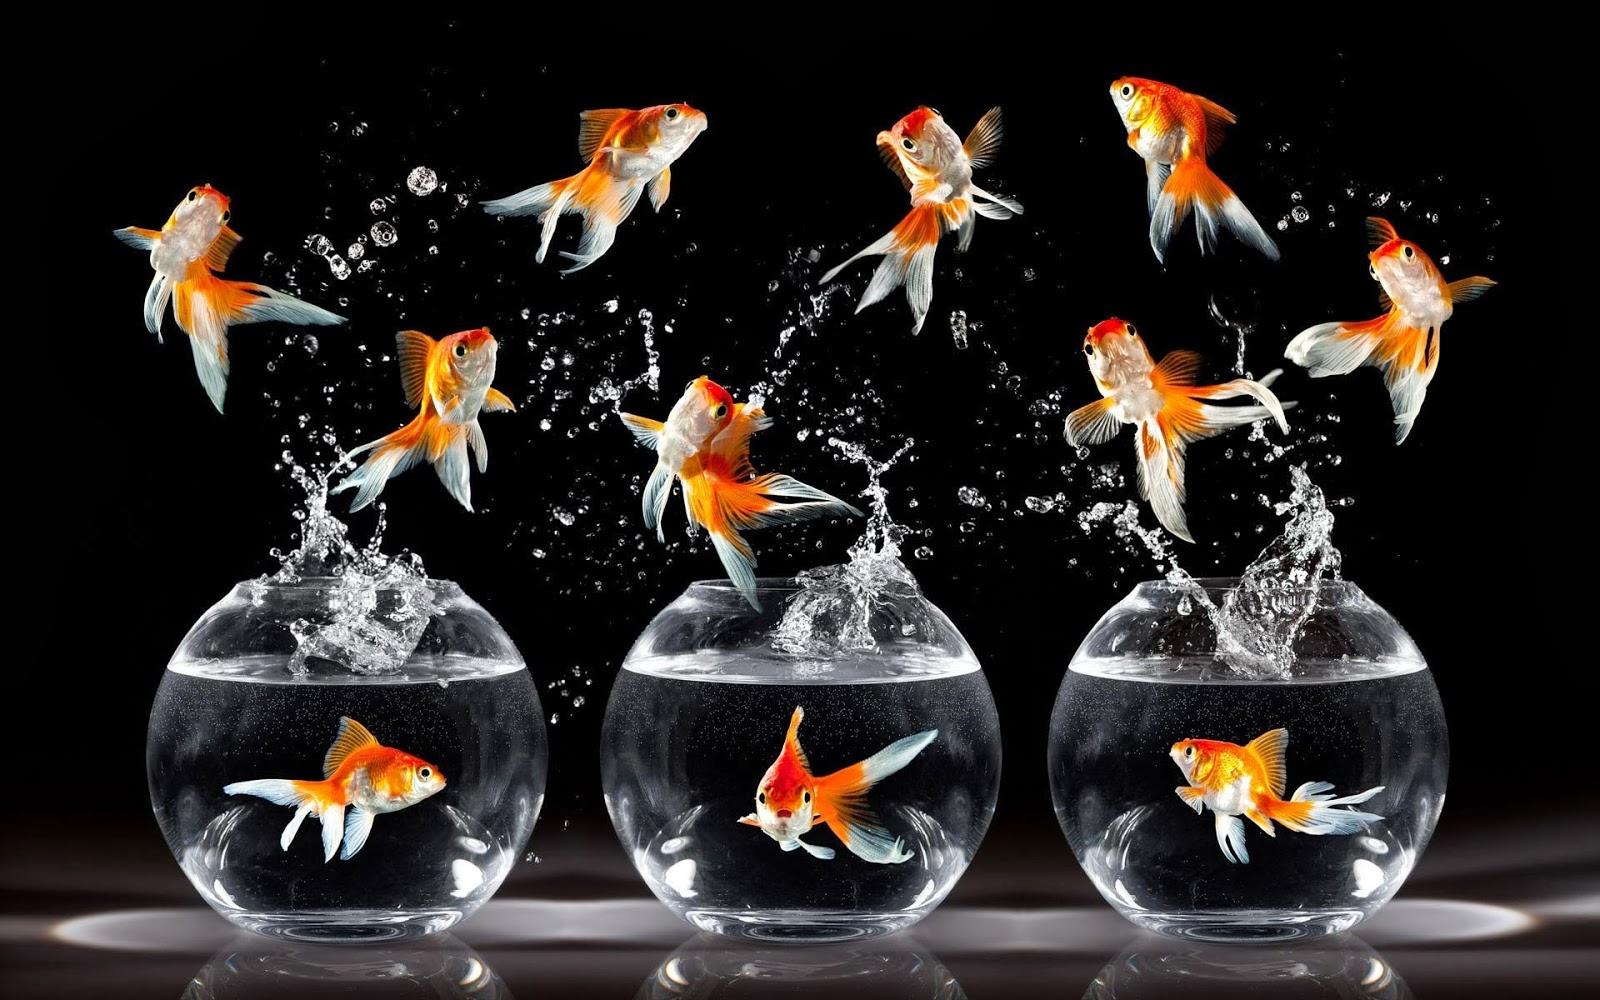 Goldfish wallpaper for walls   beautiful desktop wallpapers 2014 1600x1000